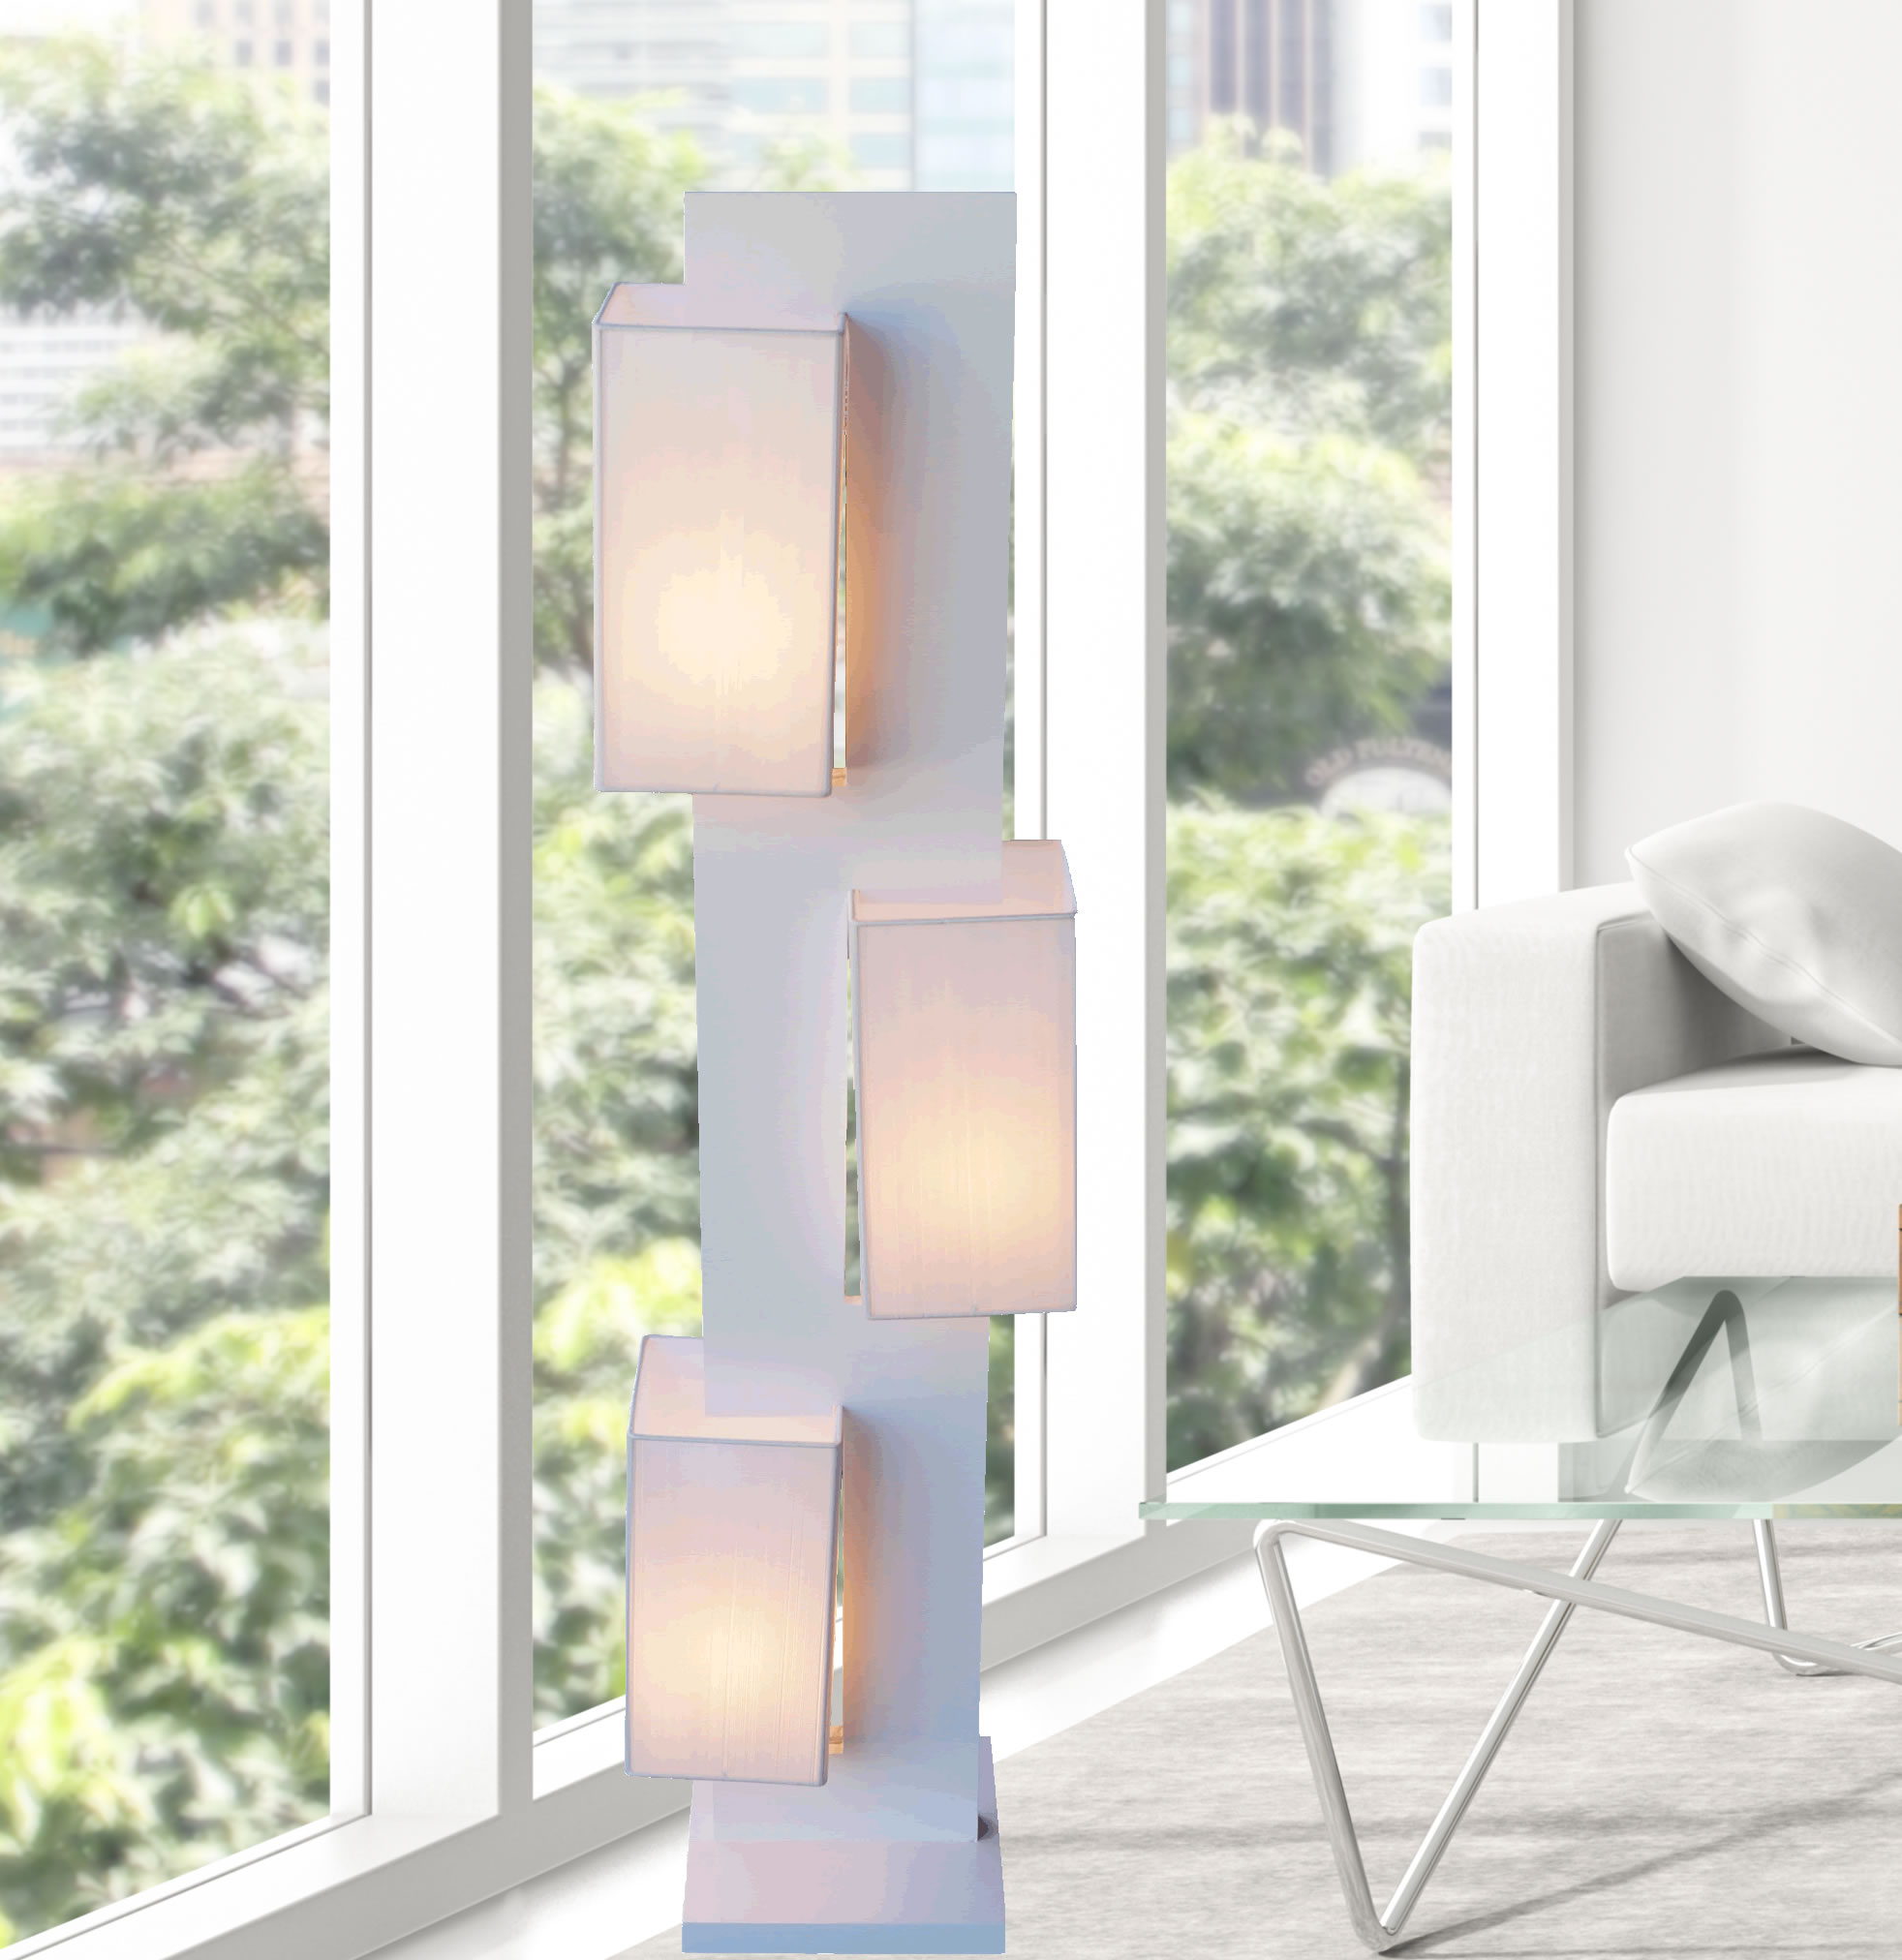 Floor lamp zk006l contemporary modern home decor lighting fixtures floor lamp zk002l contemporary modern home decor lighting fixtures stylish elegant design aloadofball Gallery